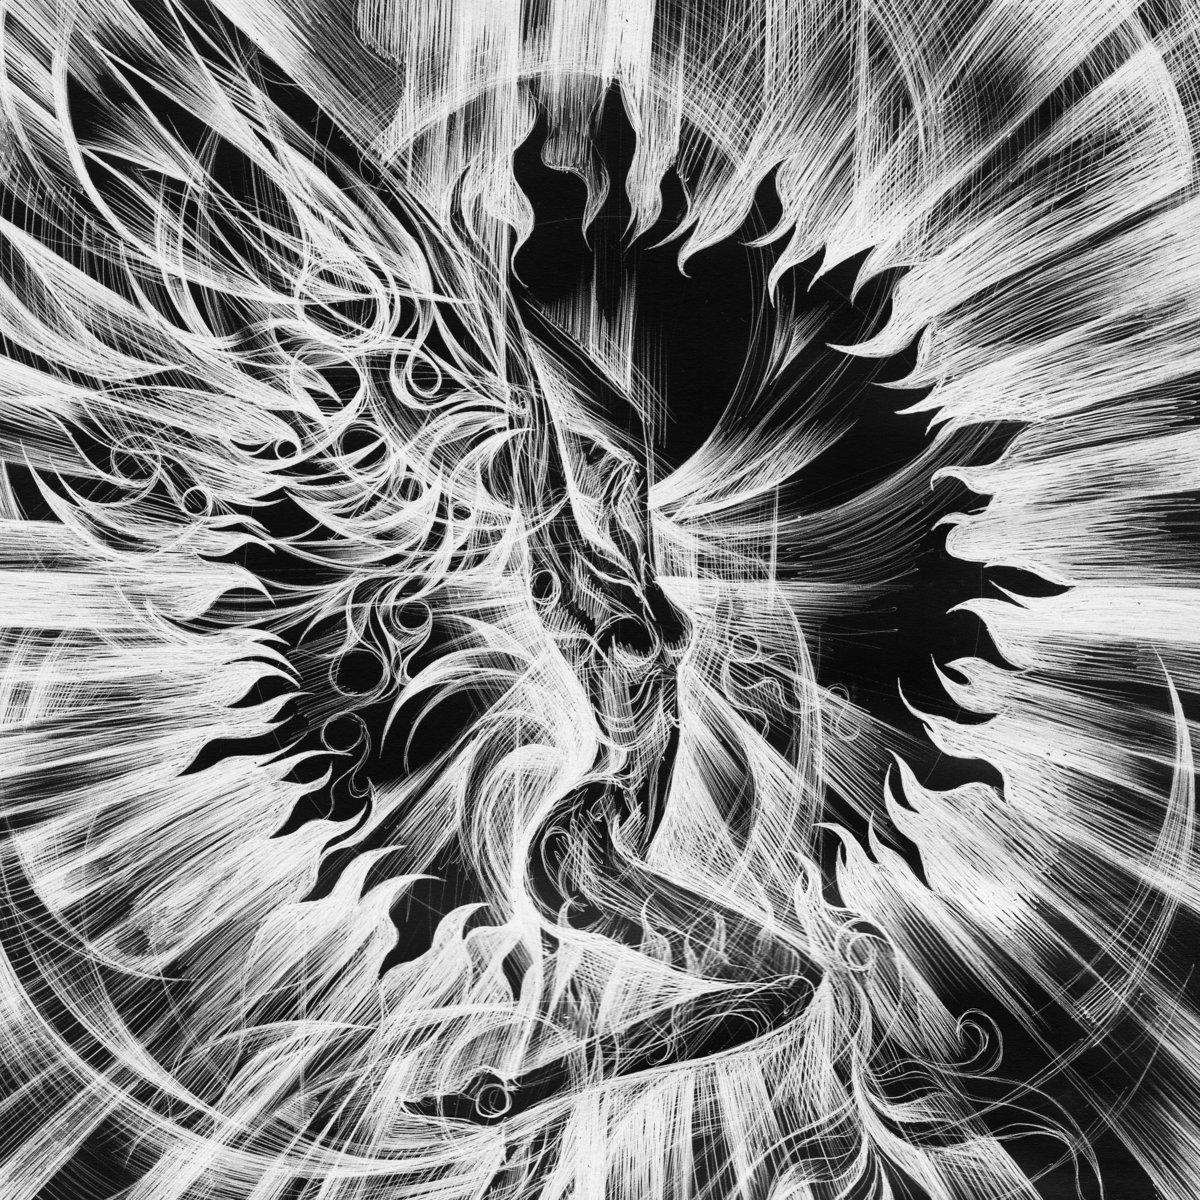 Chernaa - mesmerizing blackened death